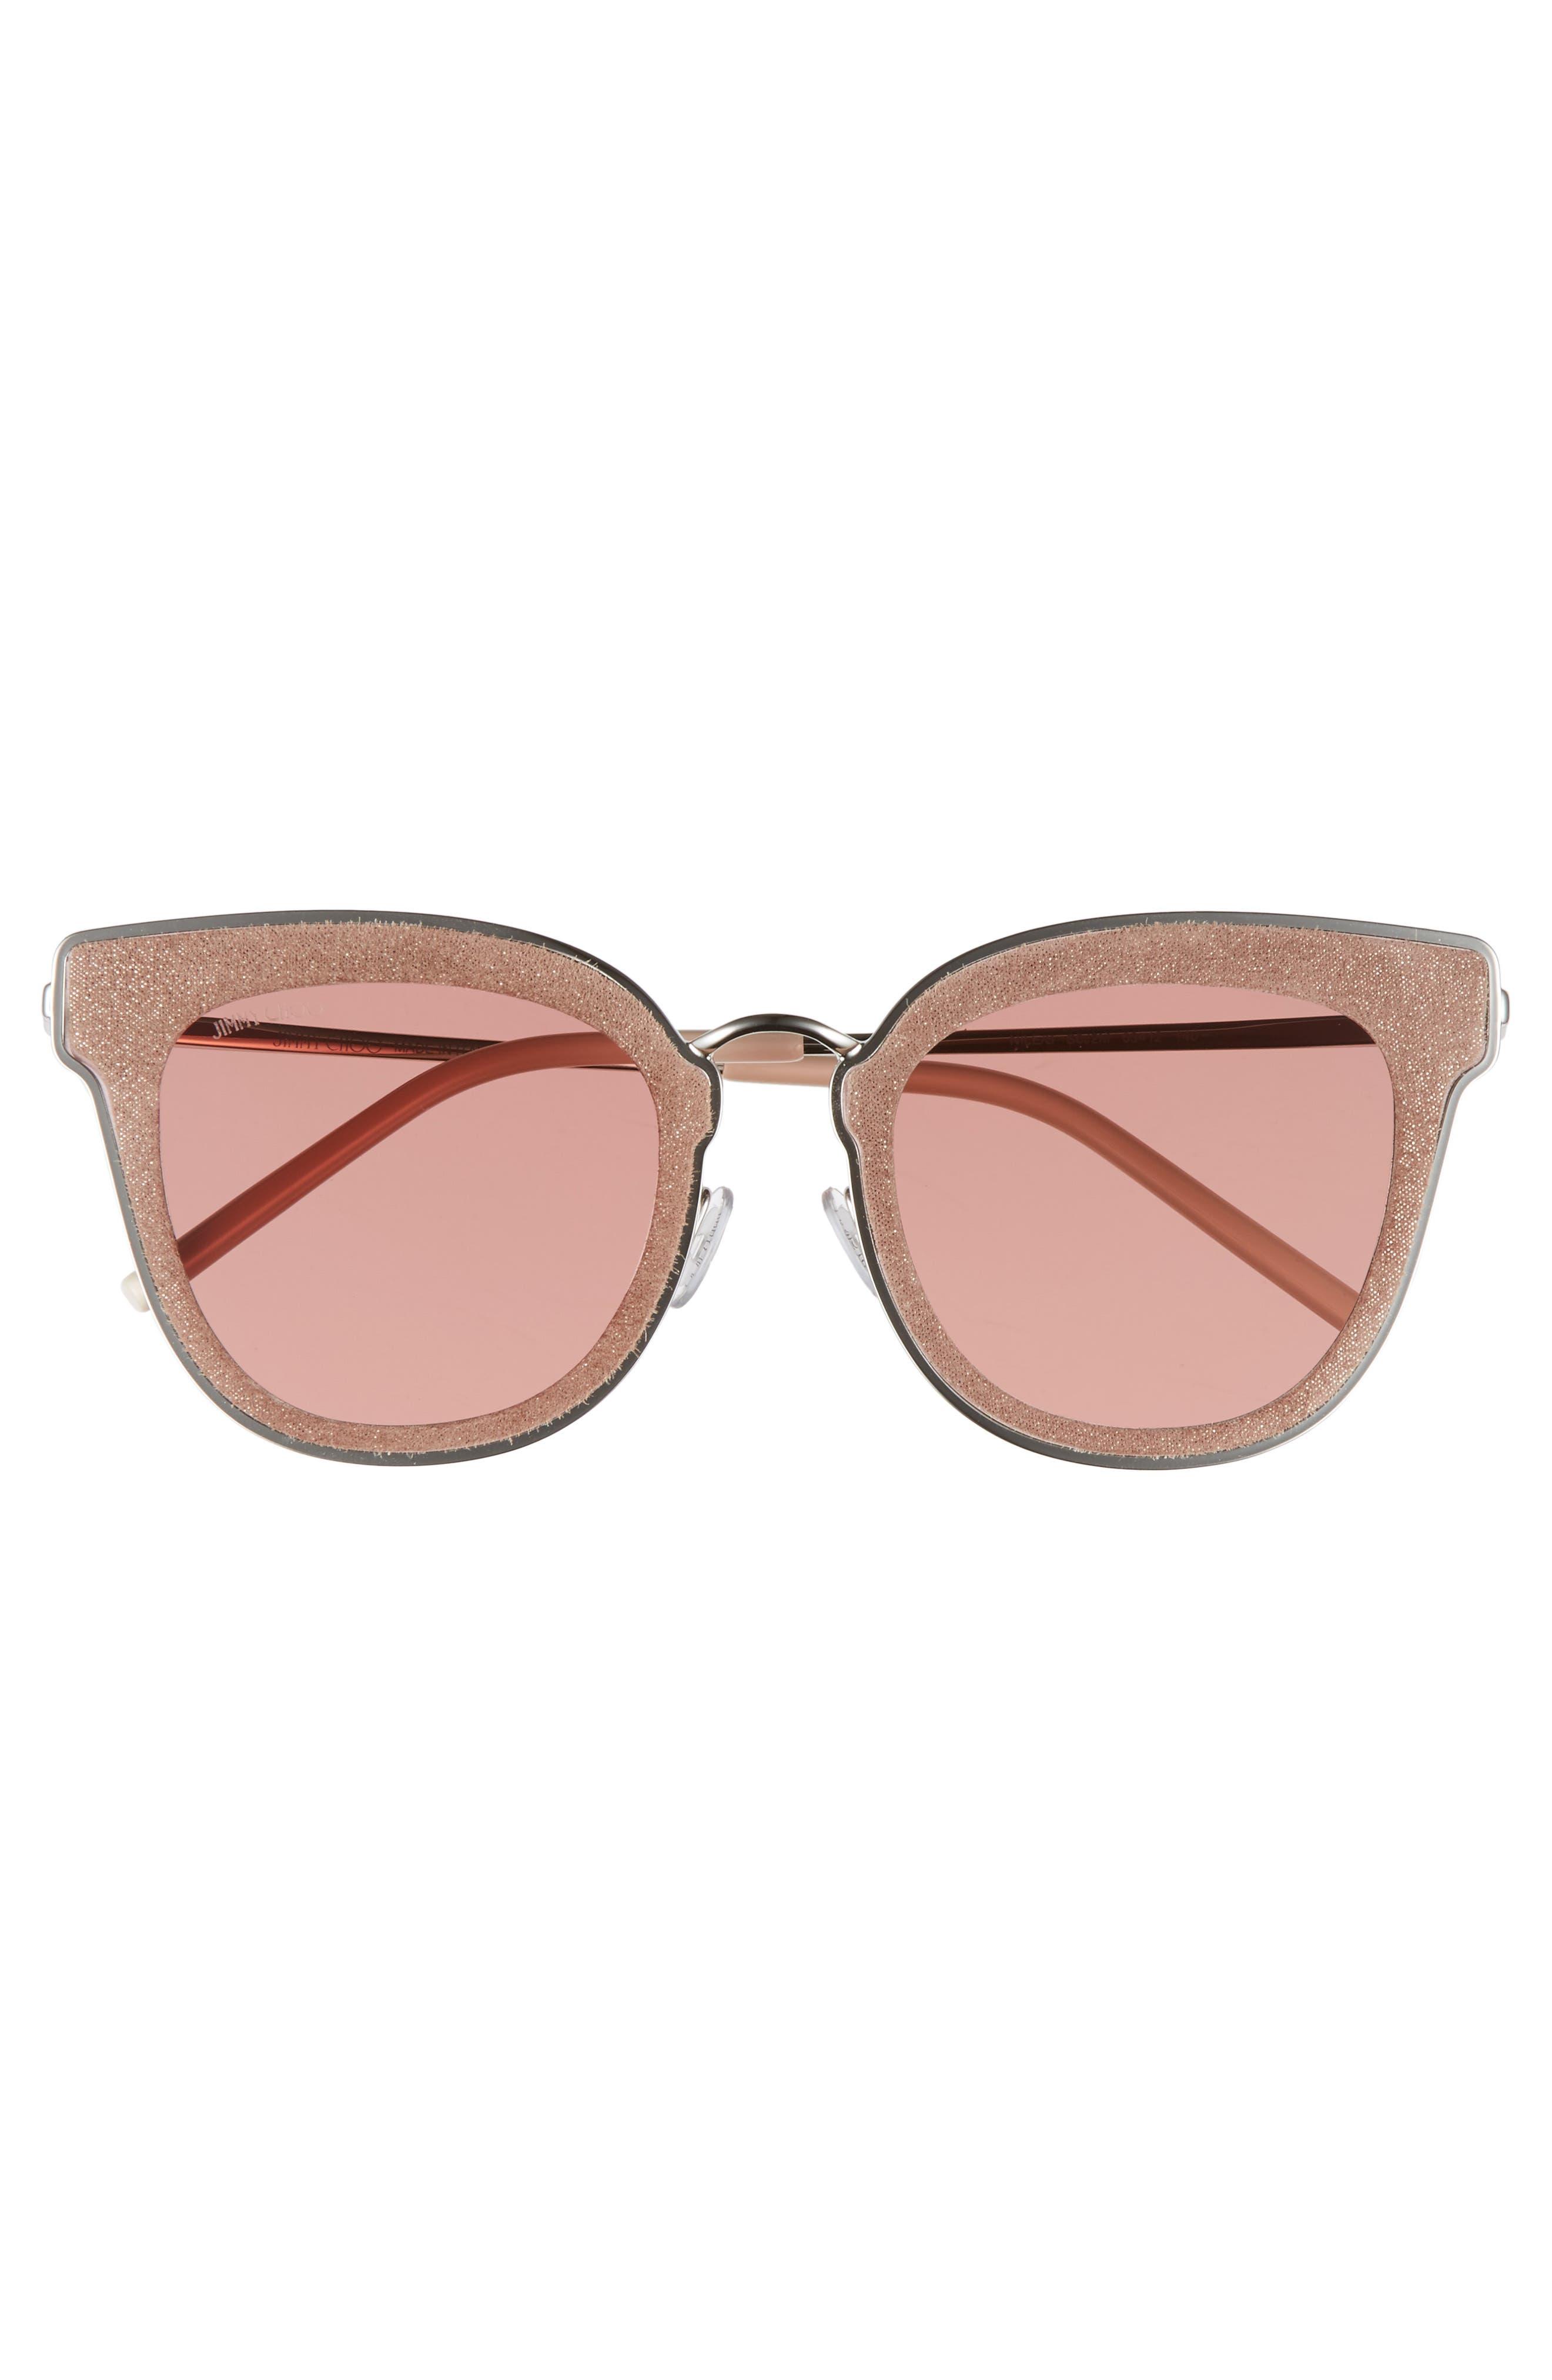 Niles 63mm Oversize Cat Eye Sunglasses,                             Alternate thumbnail 3, color,                             SILVER BEIGE